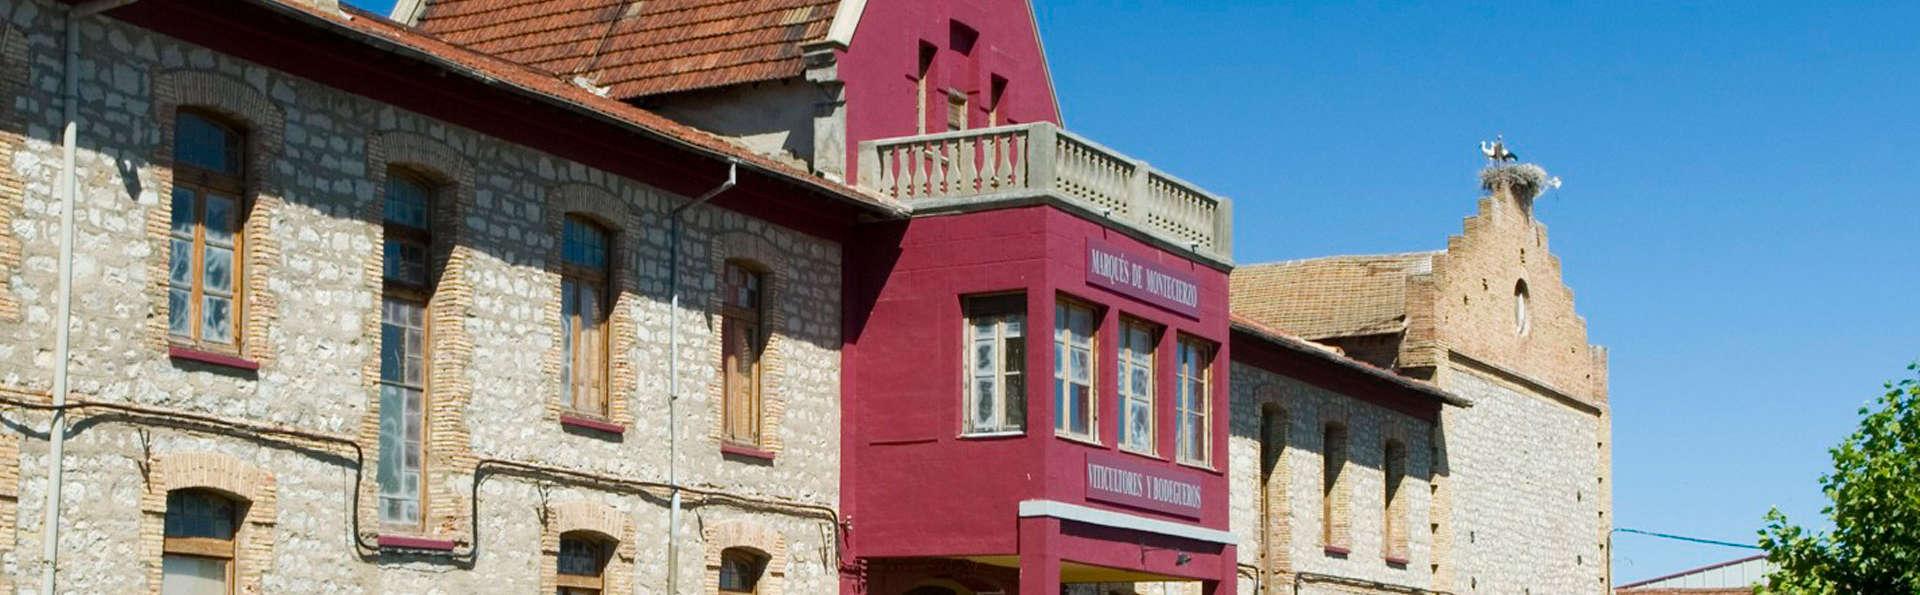 Hotel Palacios - edit_bodegamarques.jpg